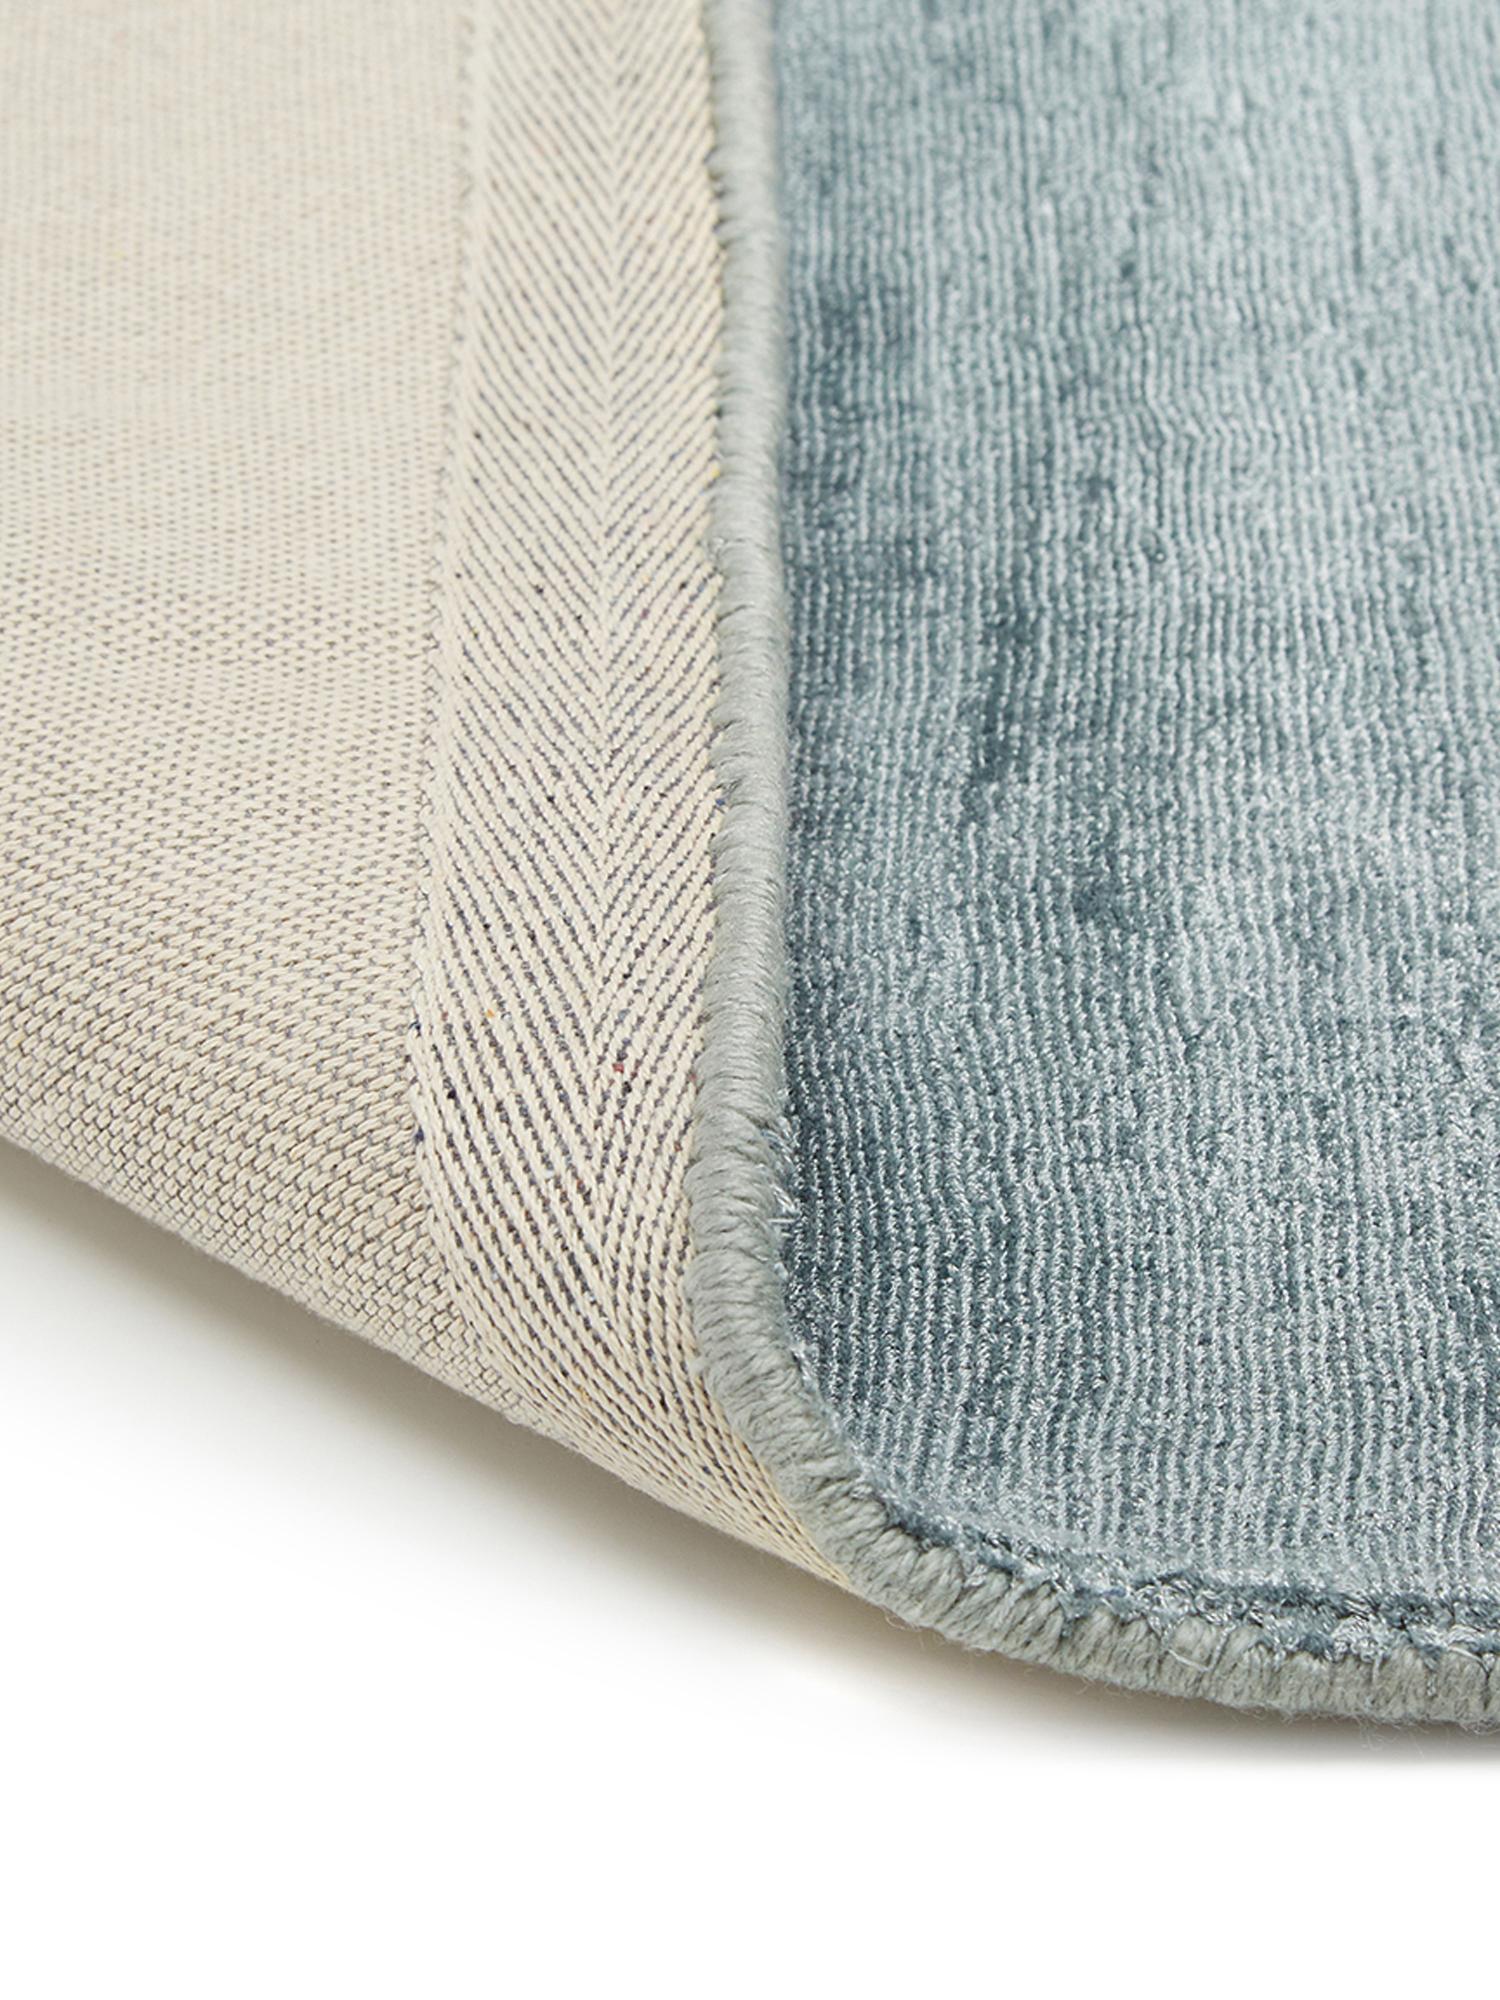 Alfombra artesanal de viscosa Jane, Parte superior: 100%viscosa, Reverso: 100%algodón, Azul hielo, An 160 x L 230 cm (Tamaño M)